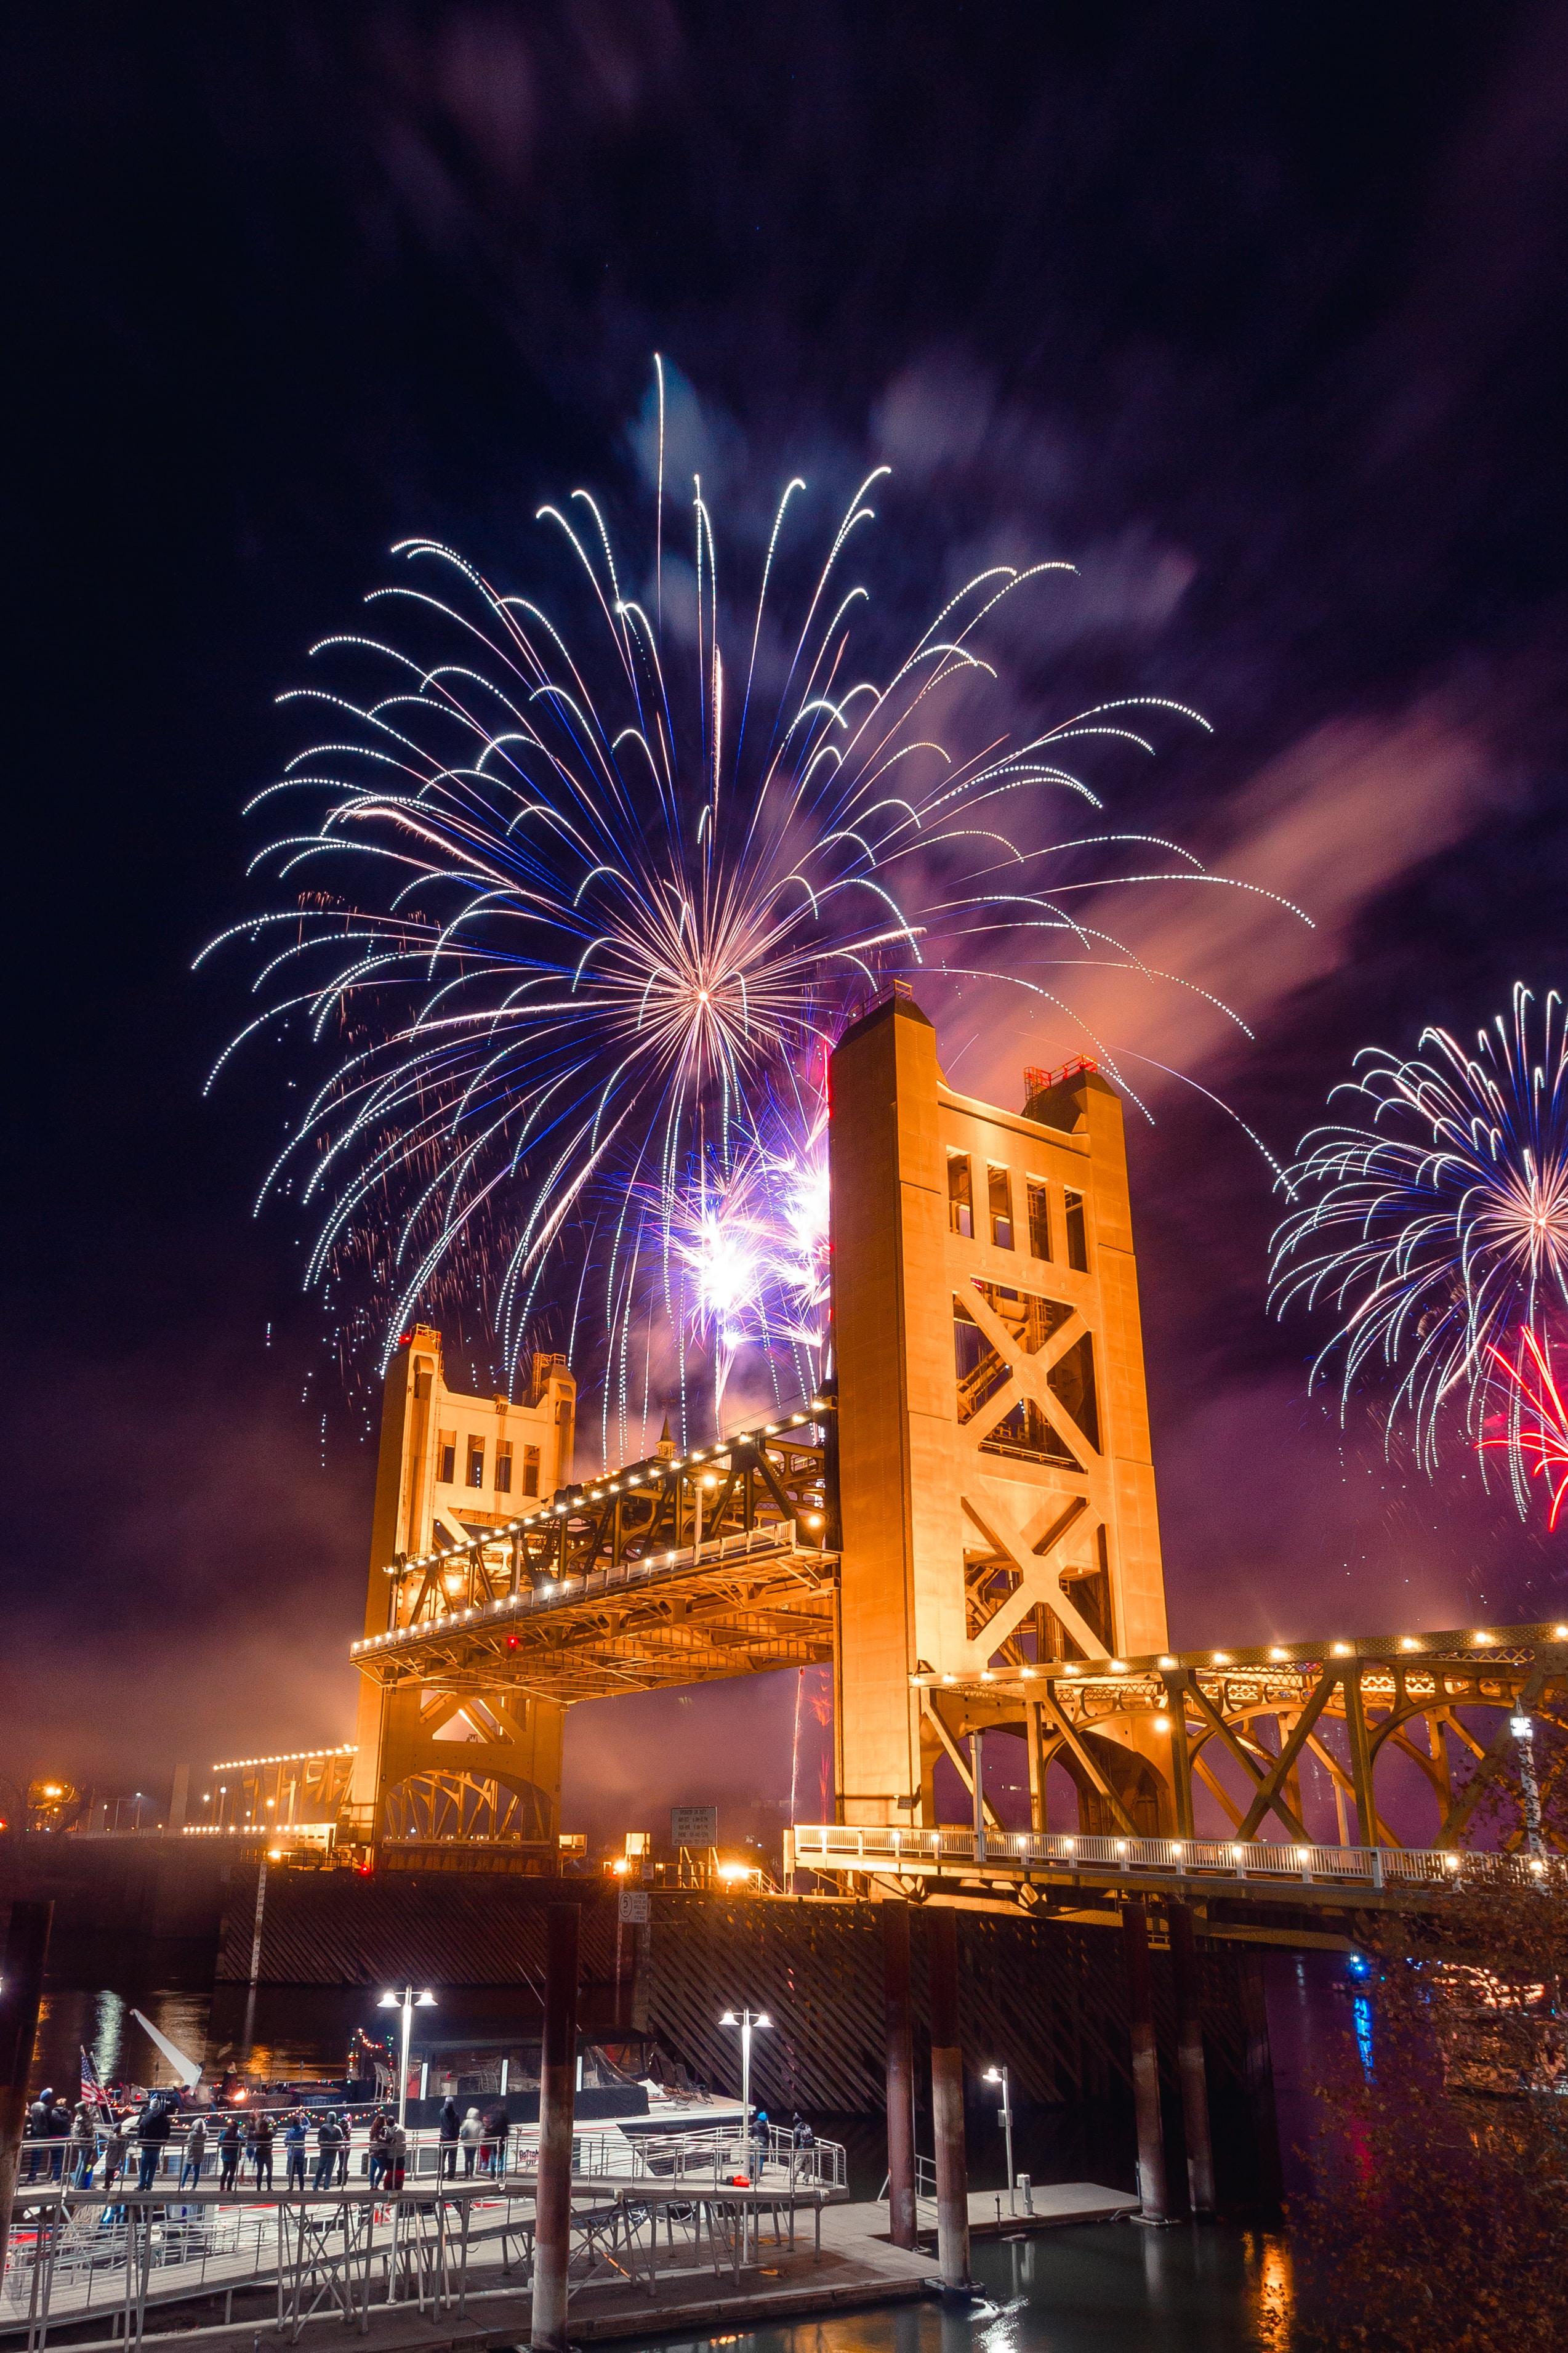 Happy new year 2020 best hd wallpaper download free